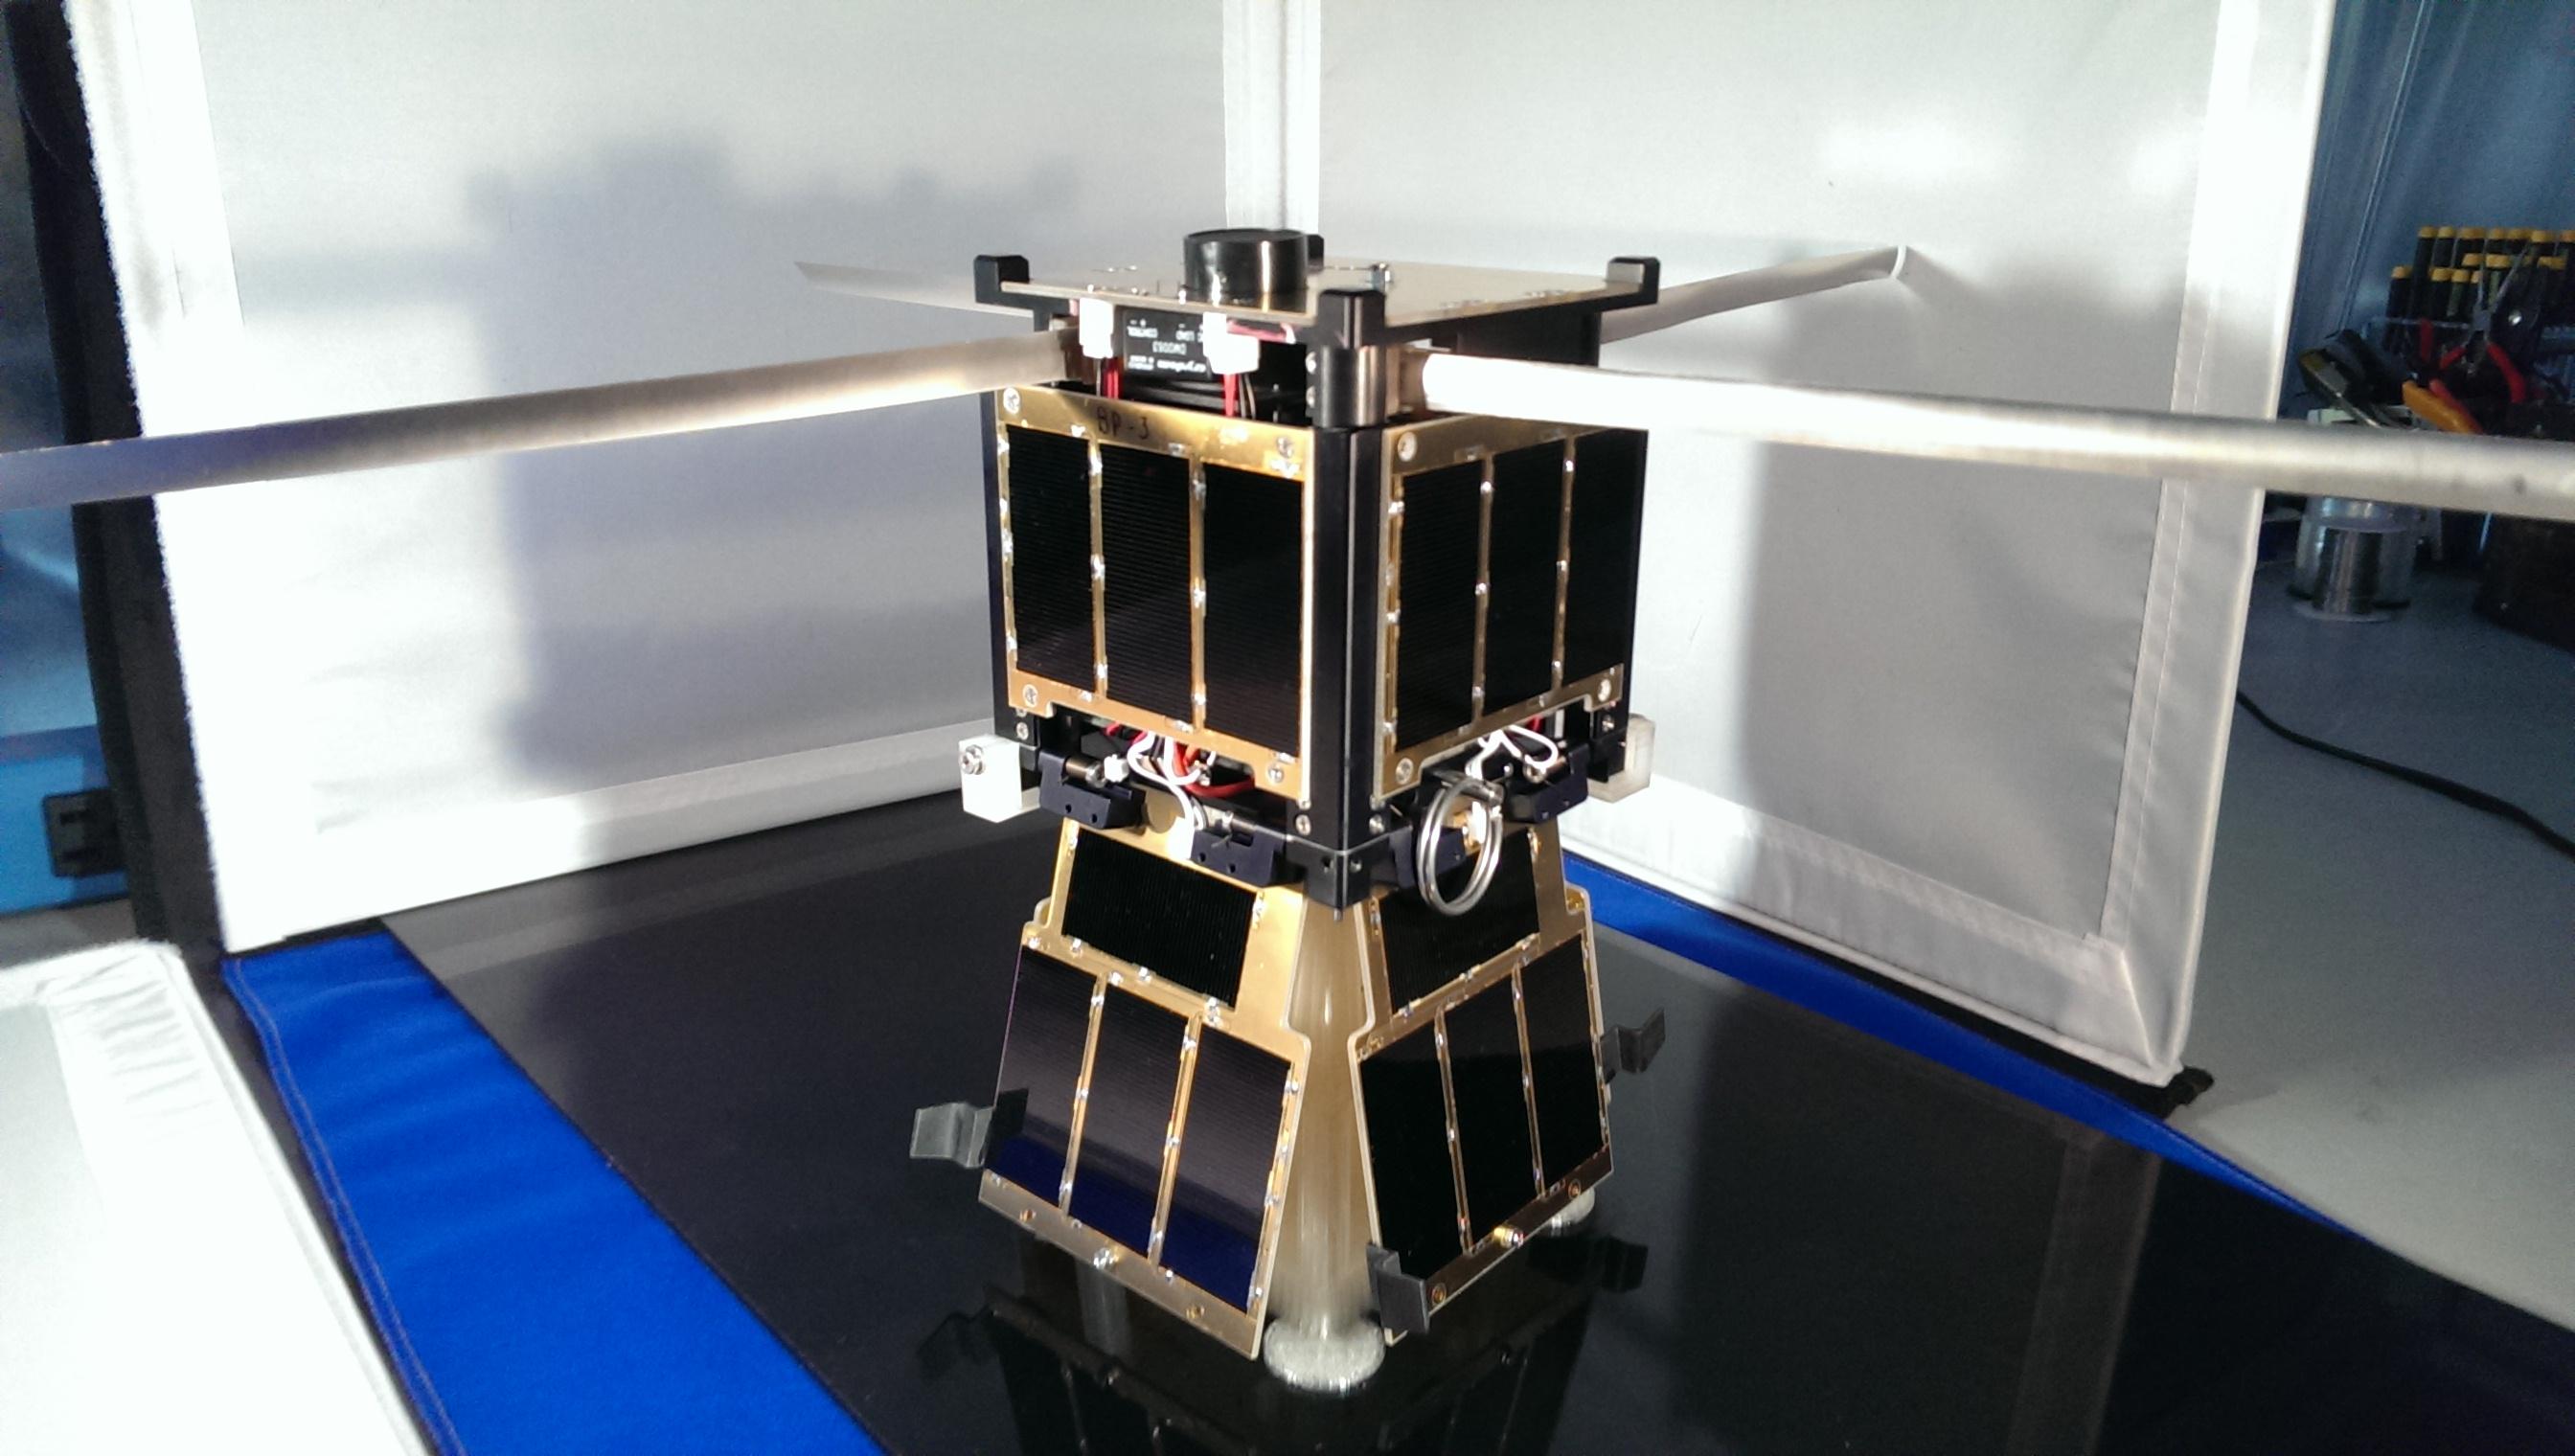 3D printing, Space, Camera, windform, kentucky